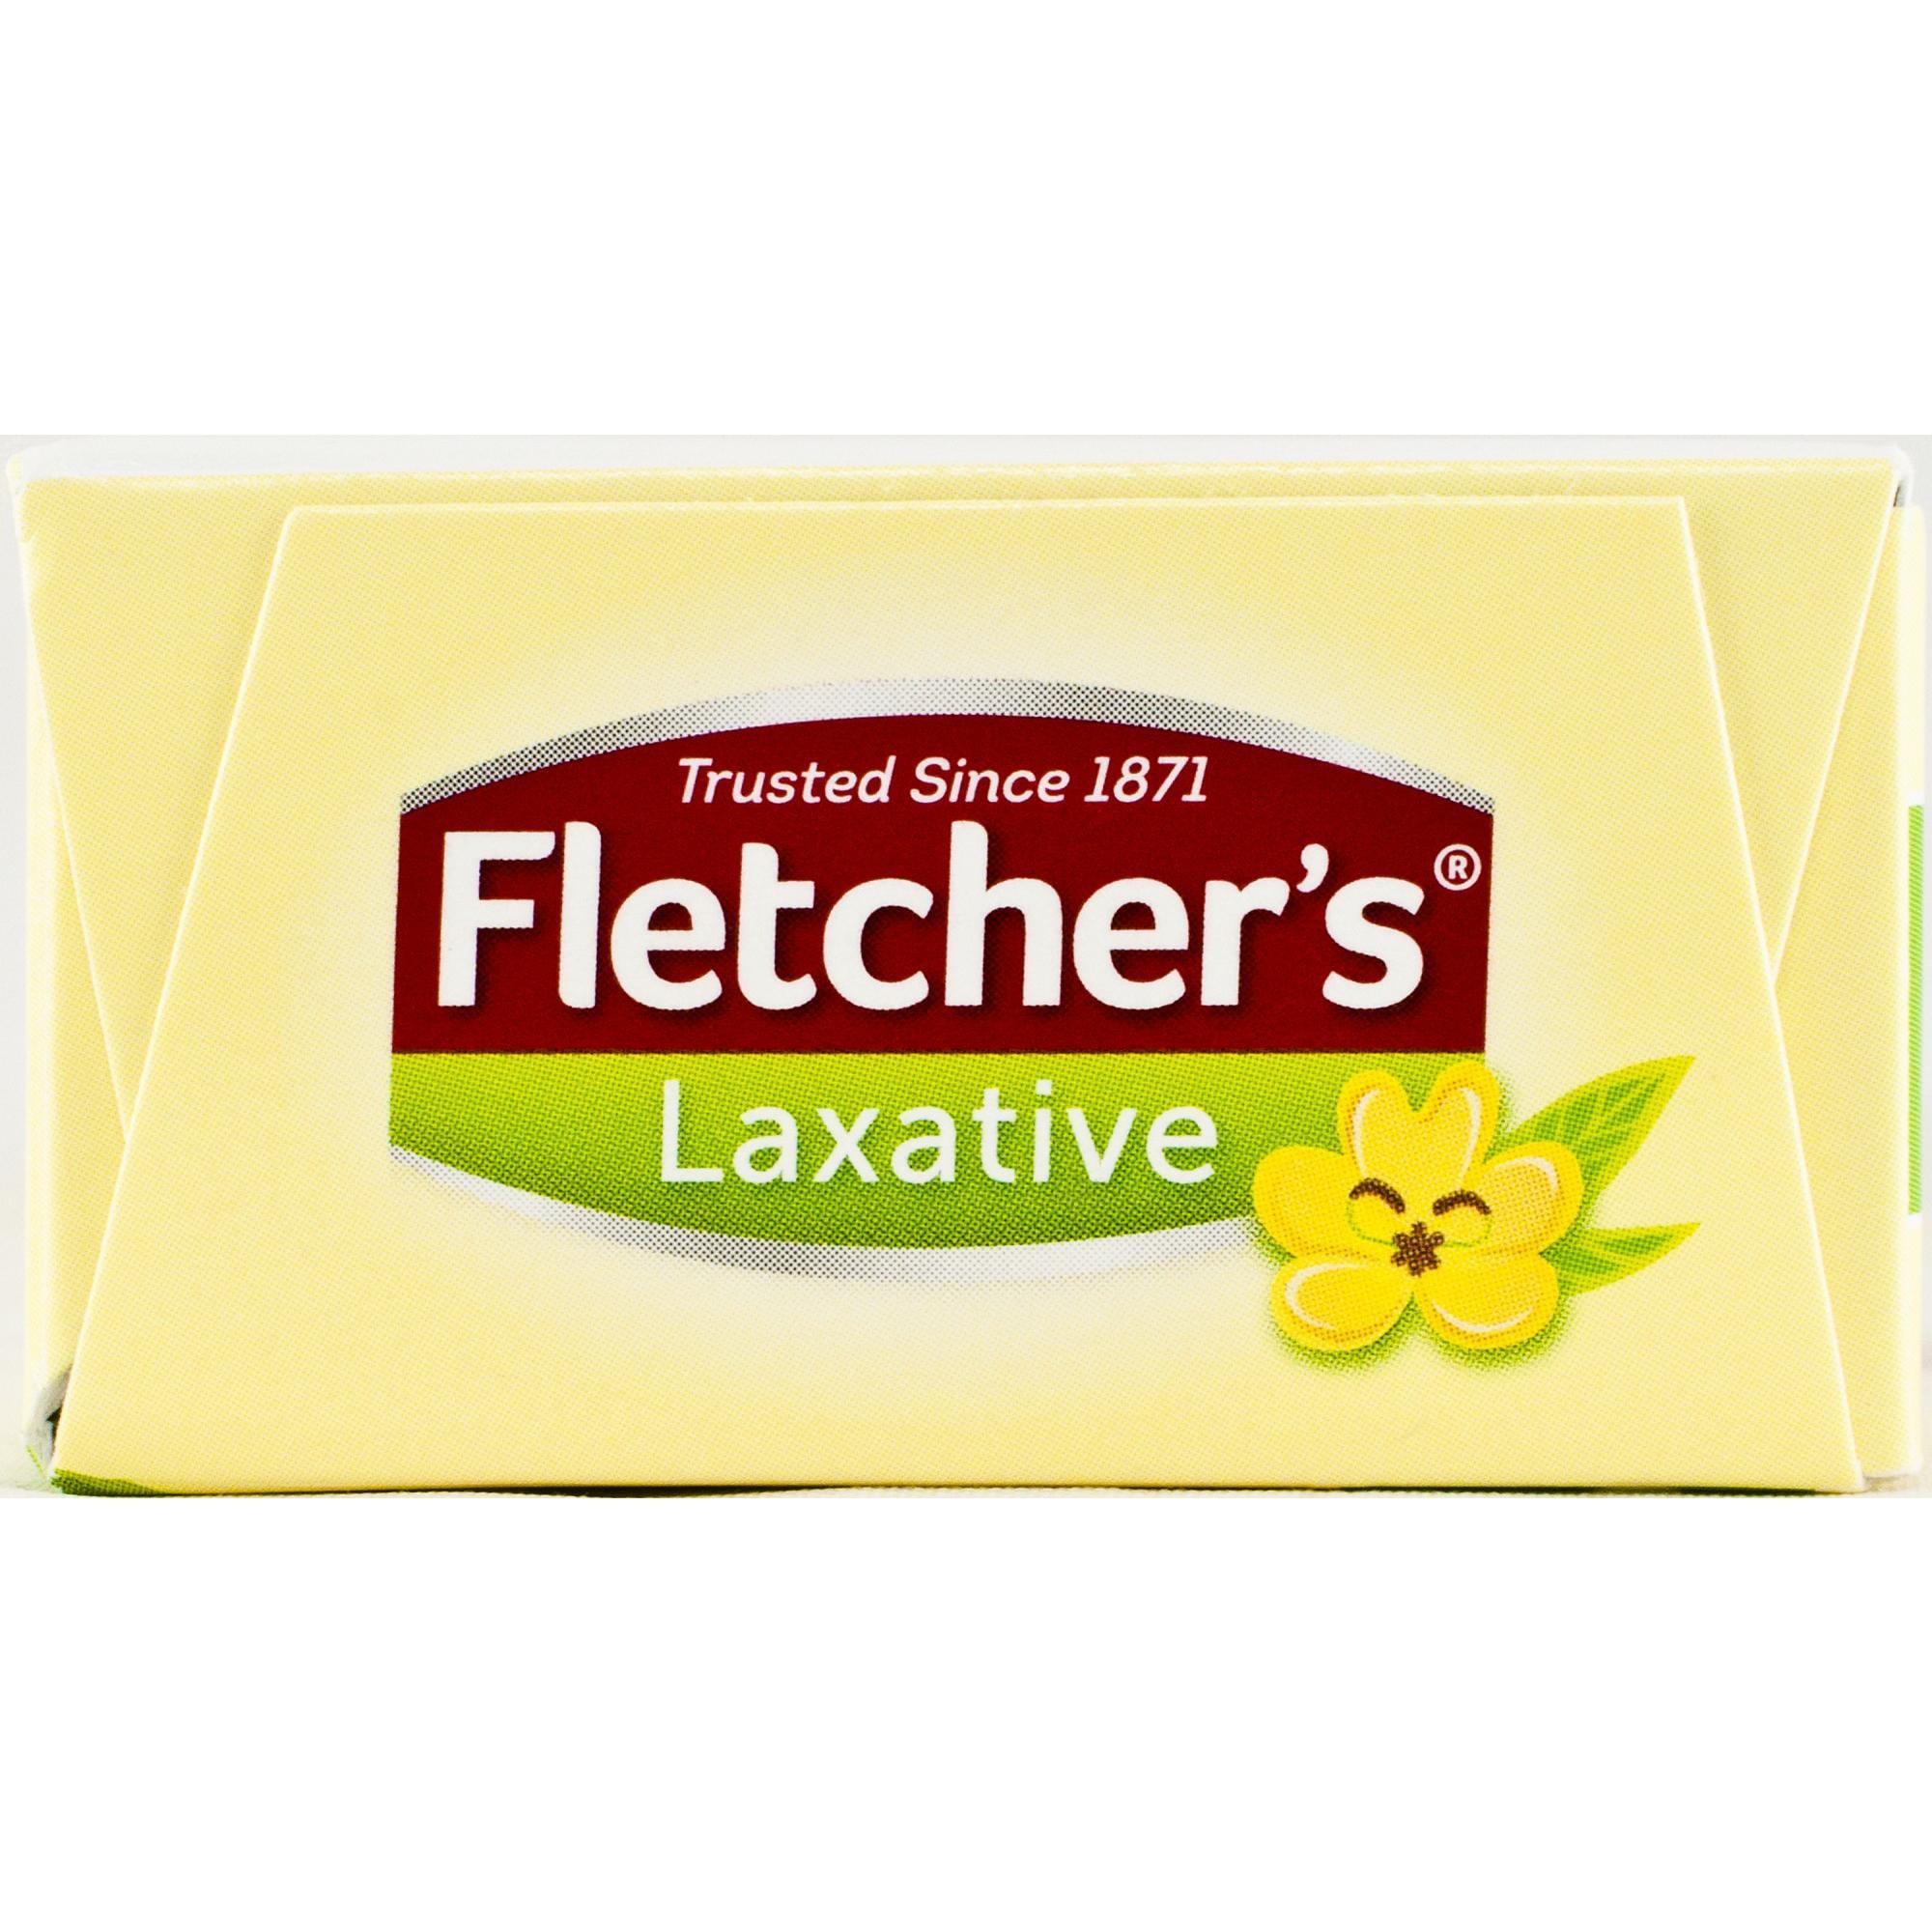 Fletcher's Gentle Relief Laxative, 3 25 FL OZ - Walmart com